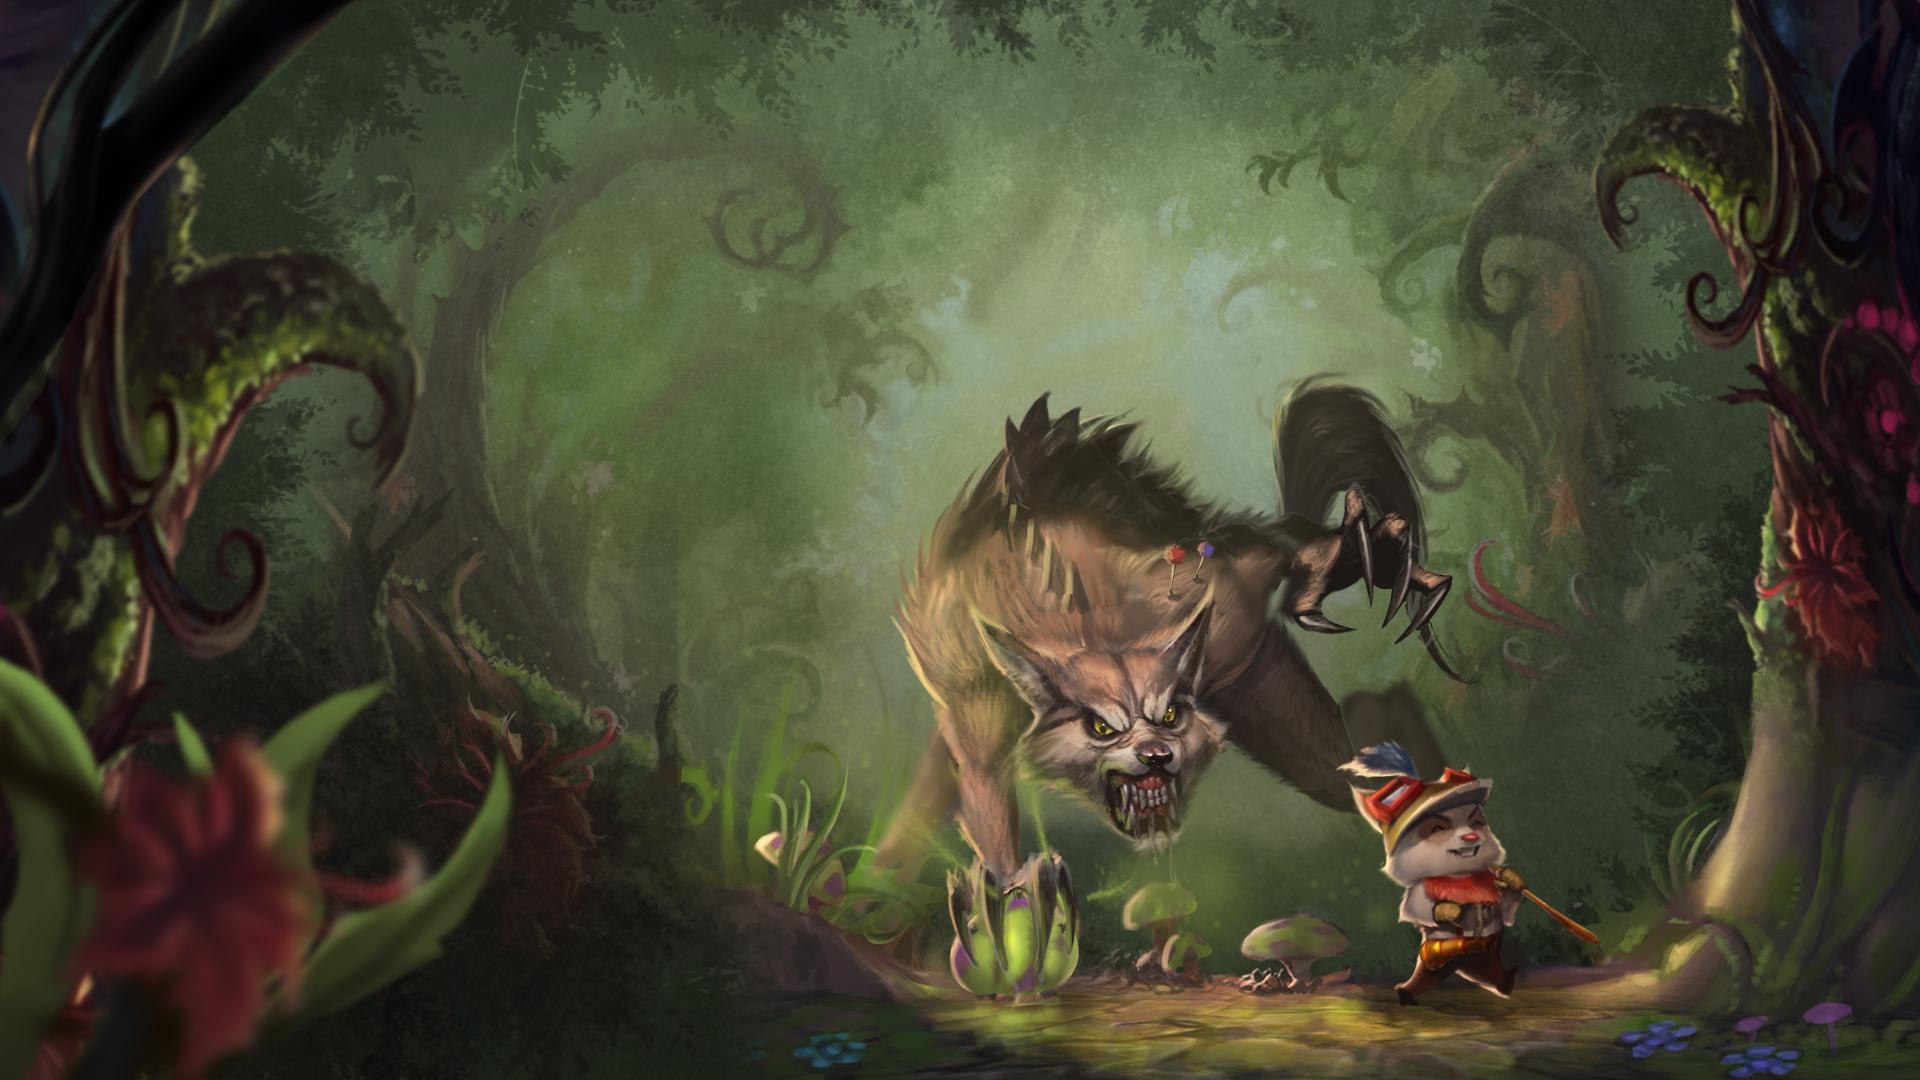 League of Legends wallpaper 3